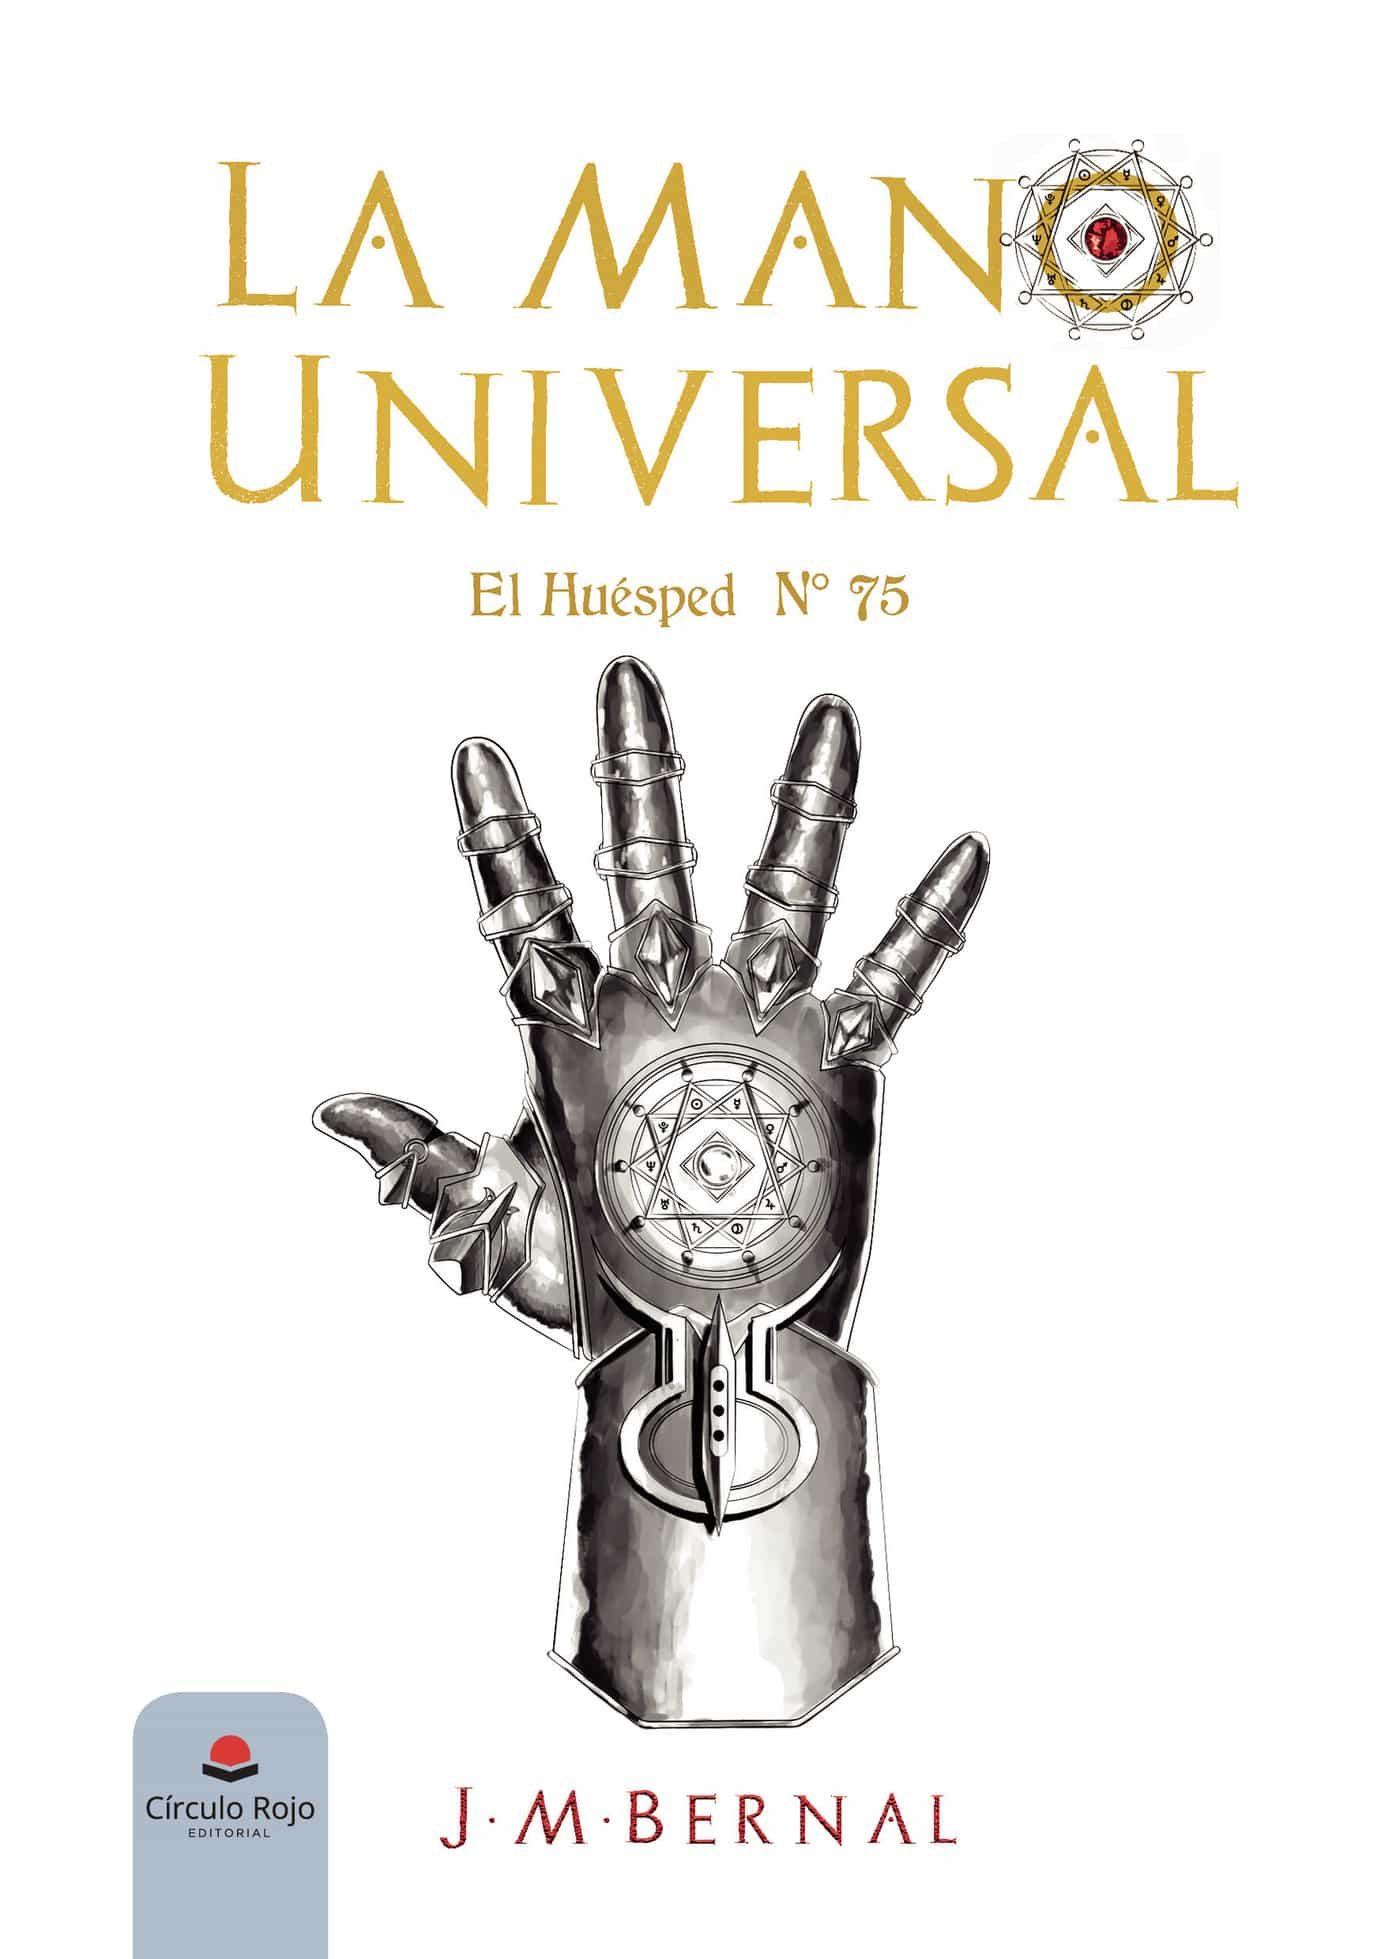 La Mano Universal - El Huesped N° 75 - Bernal J.m.